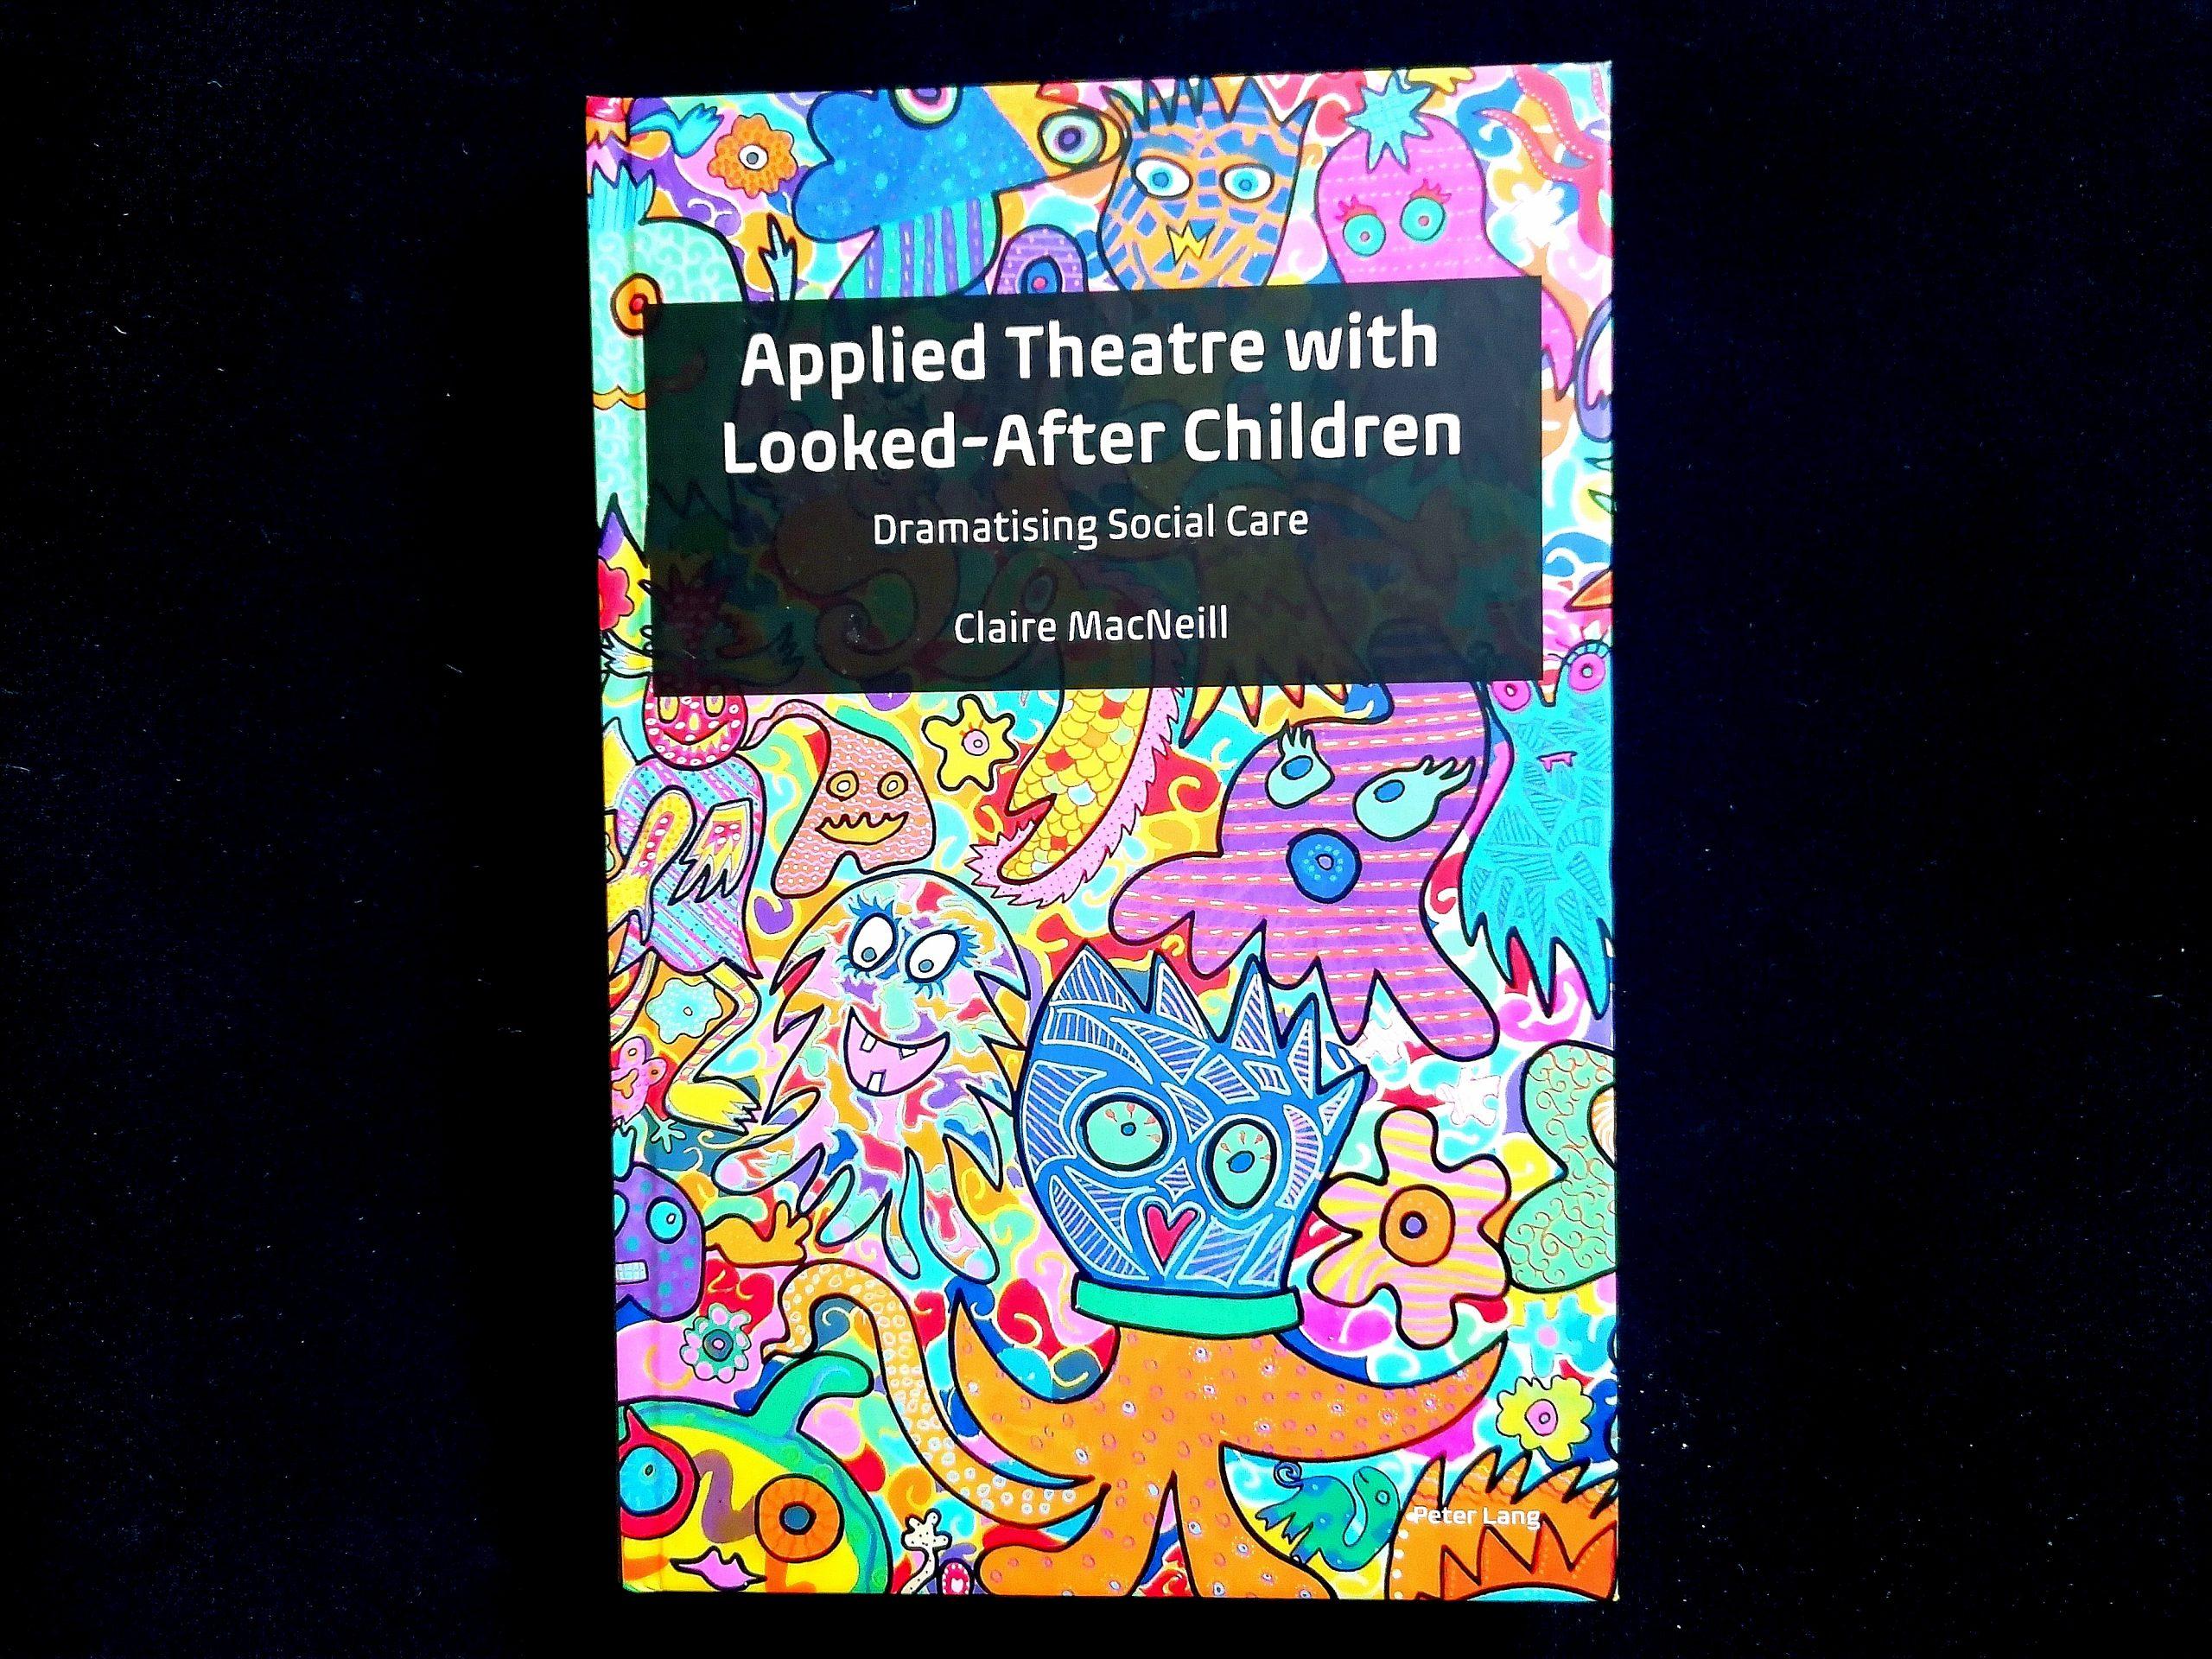 Dramatising Social Care (book)